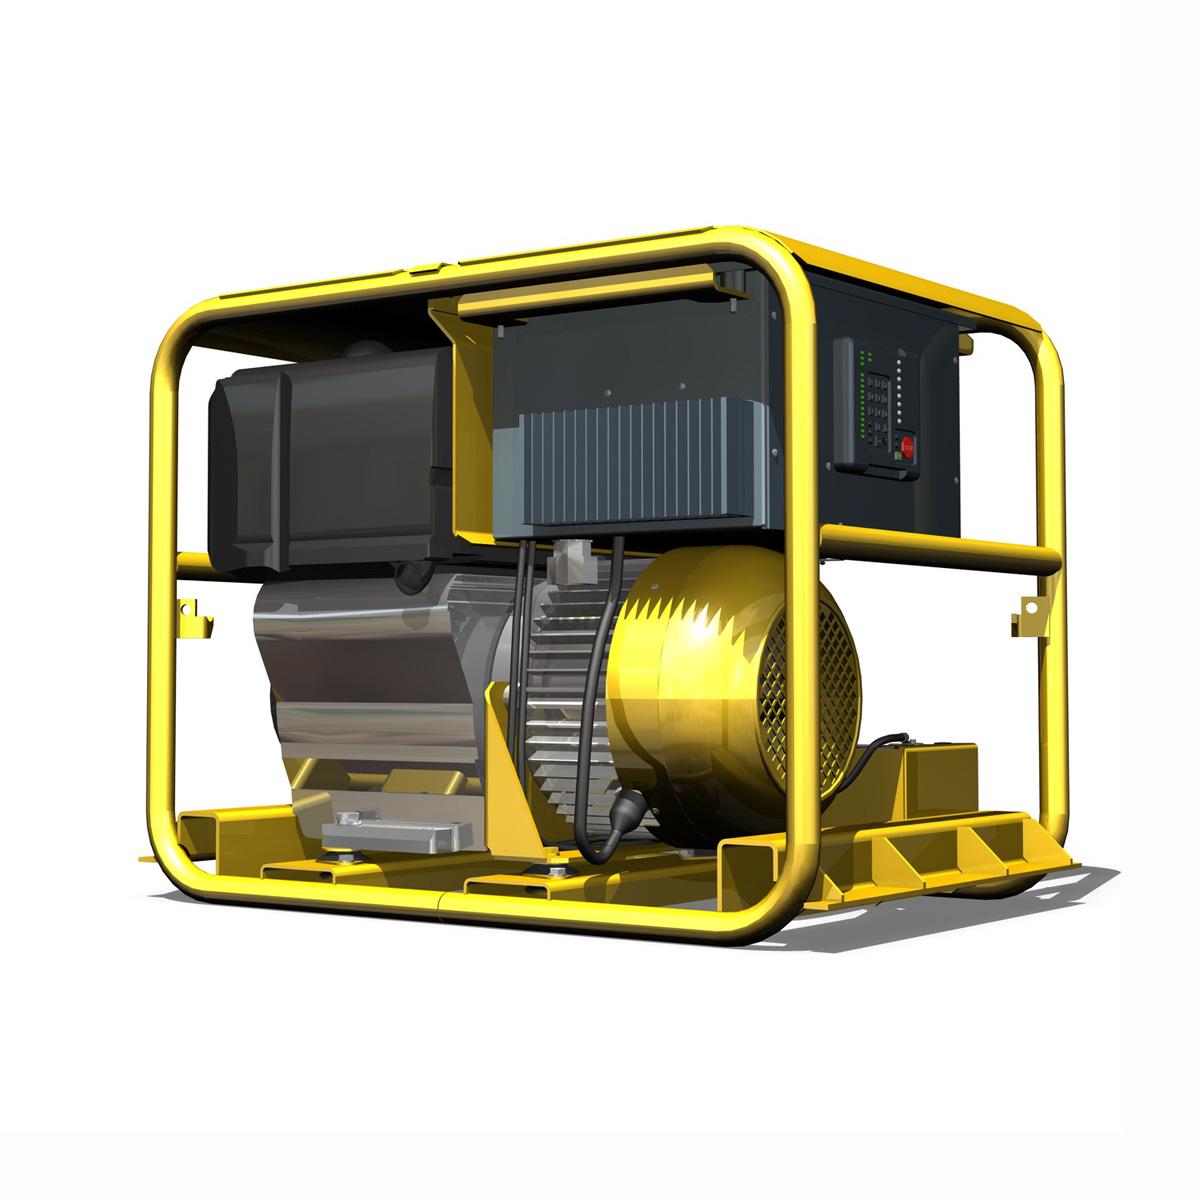 diesel generator 3d model 3ds fbx c4d lwo obj 188589